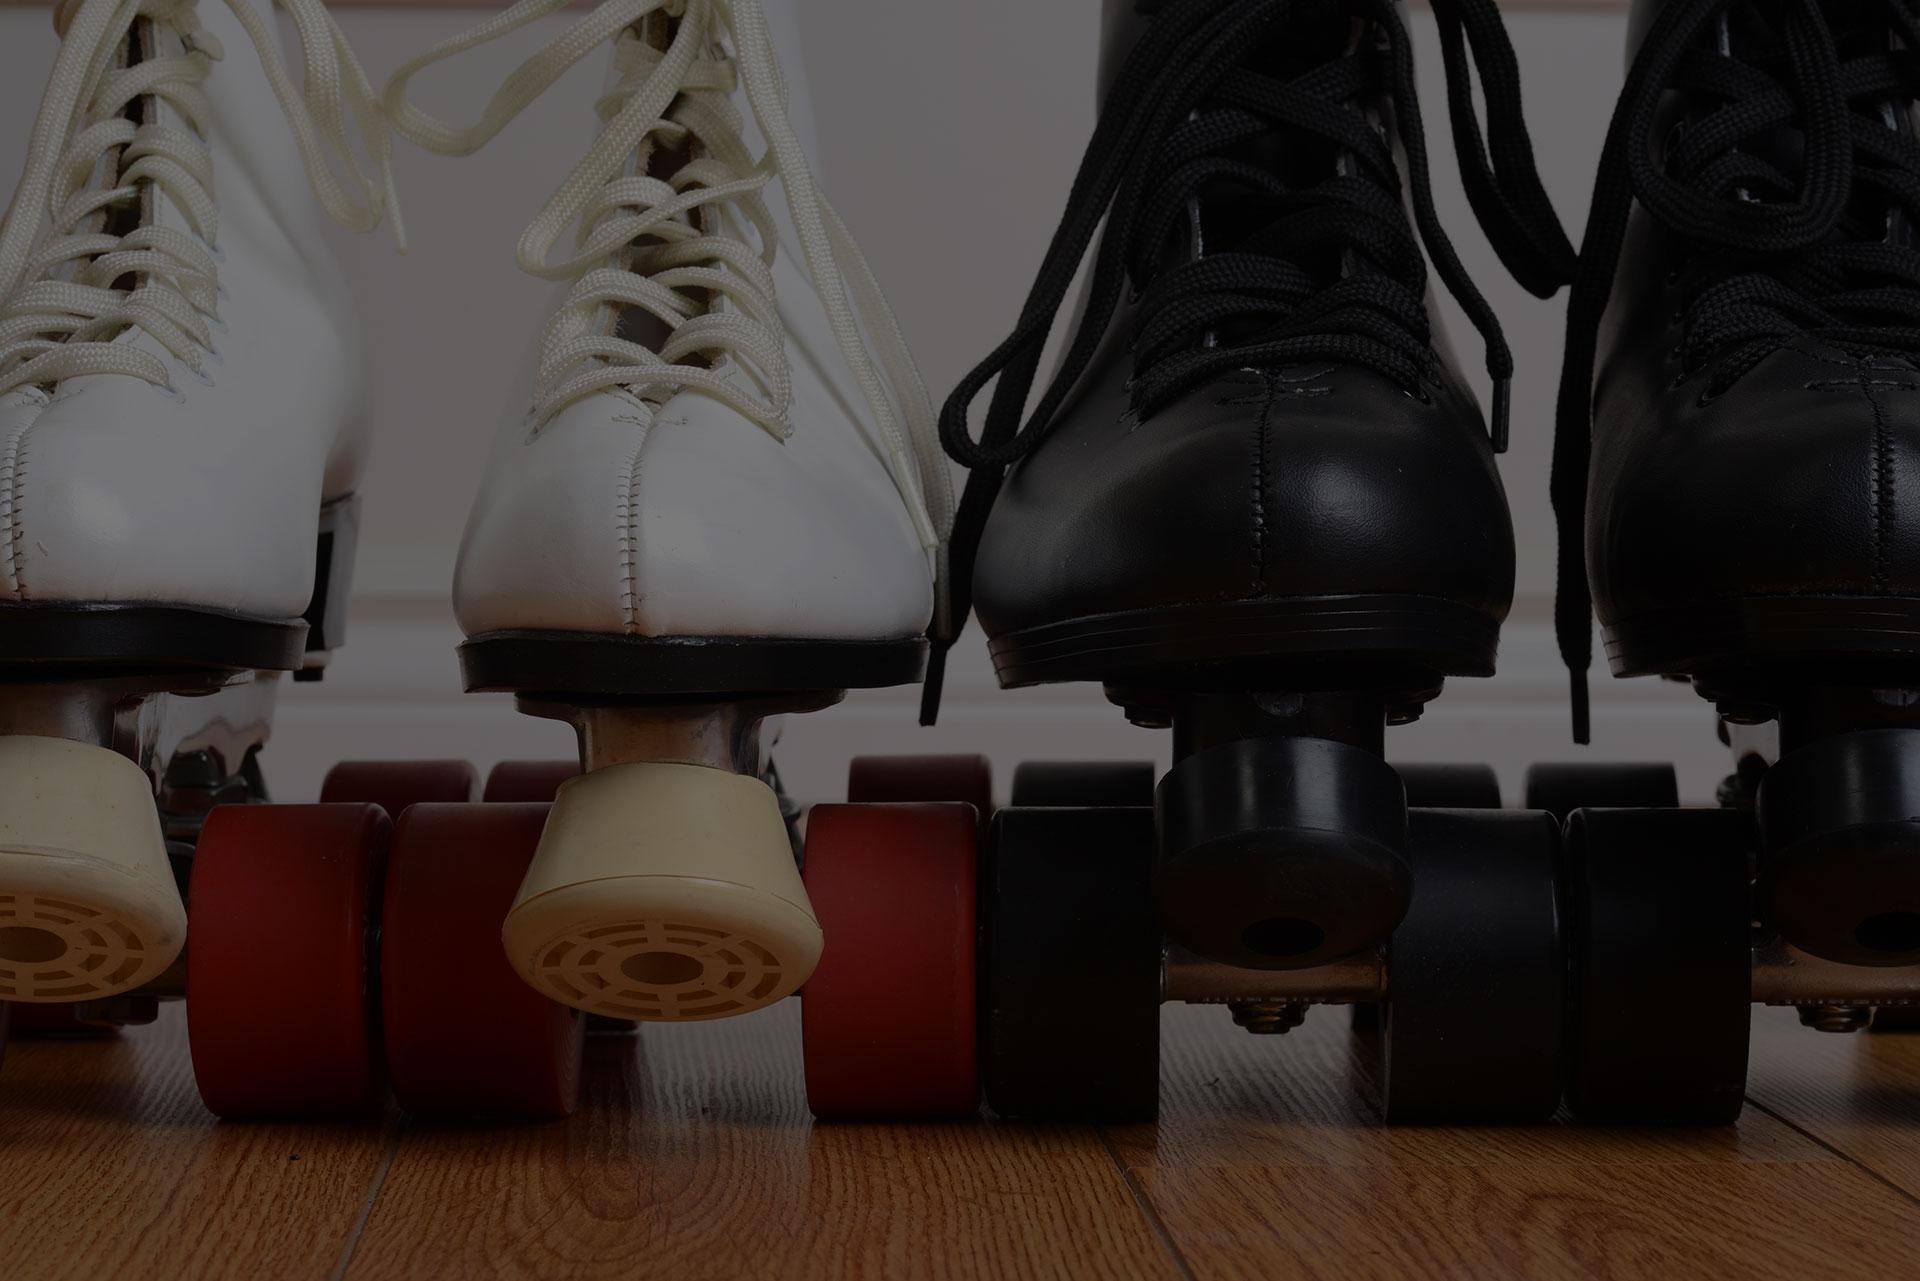 closeup front view quad roller skates